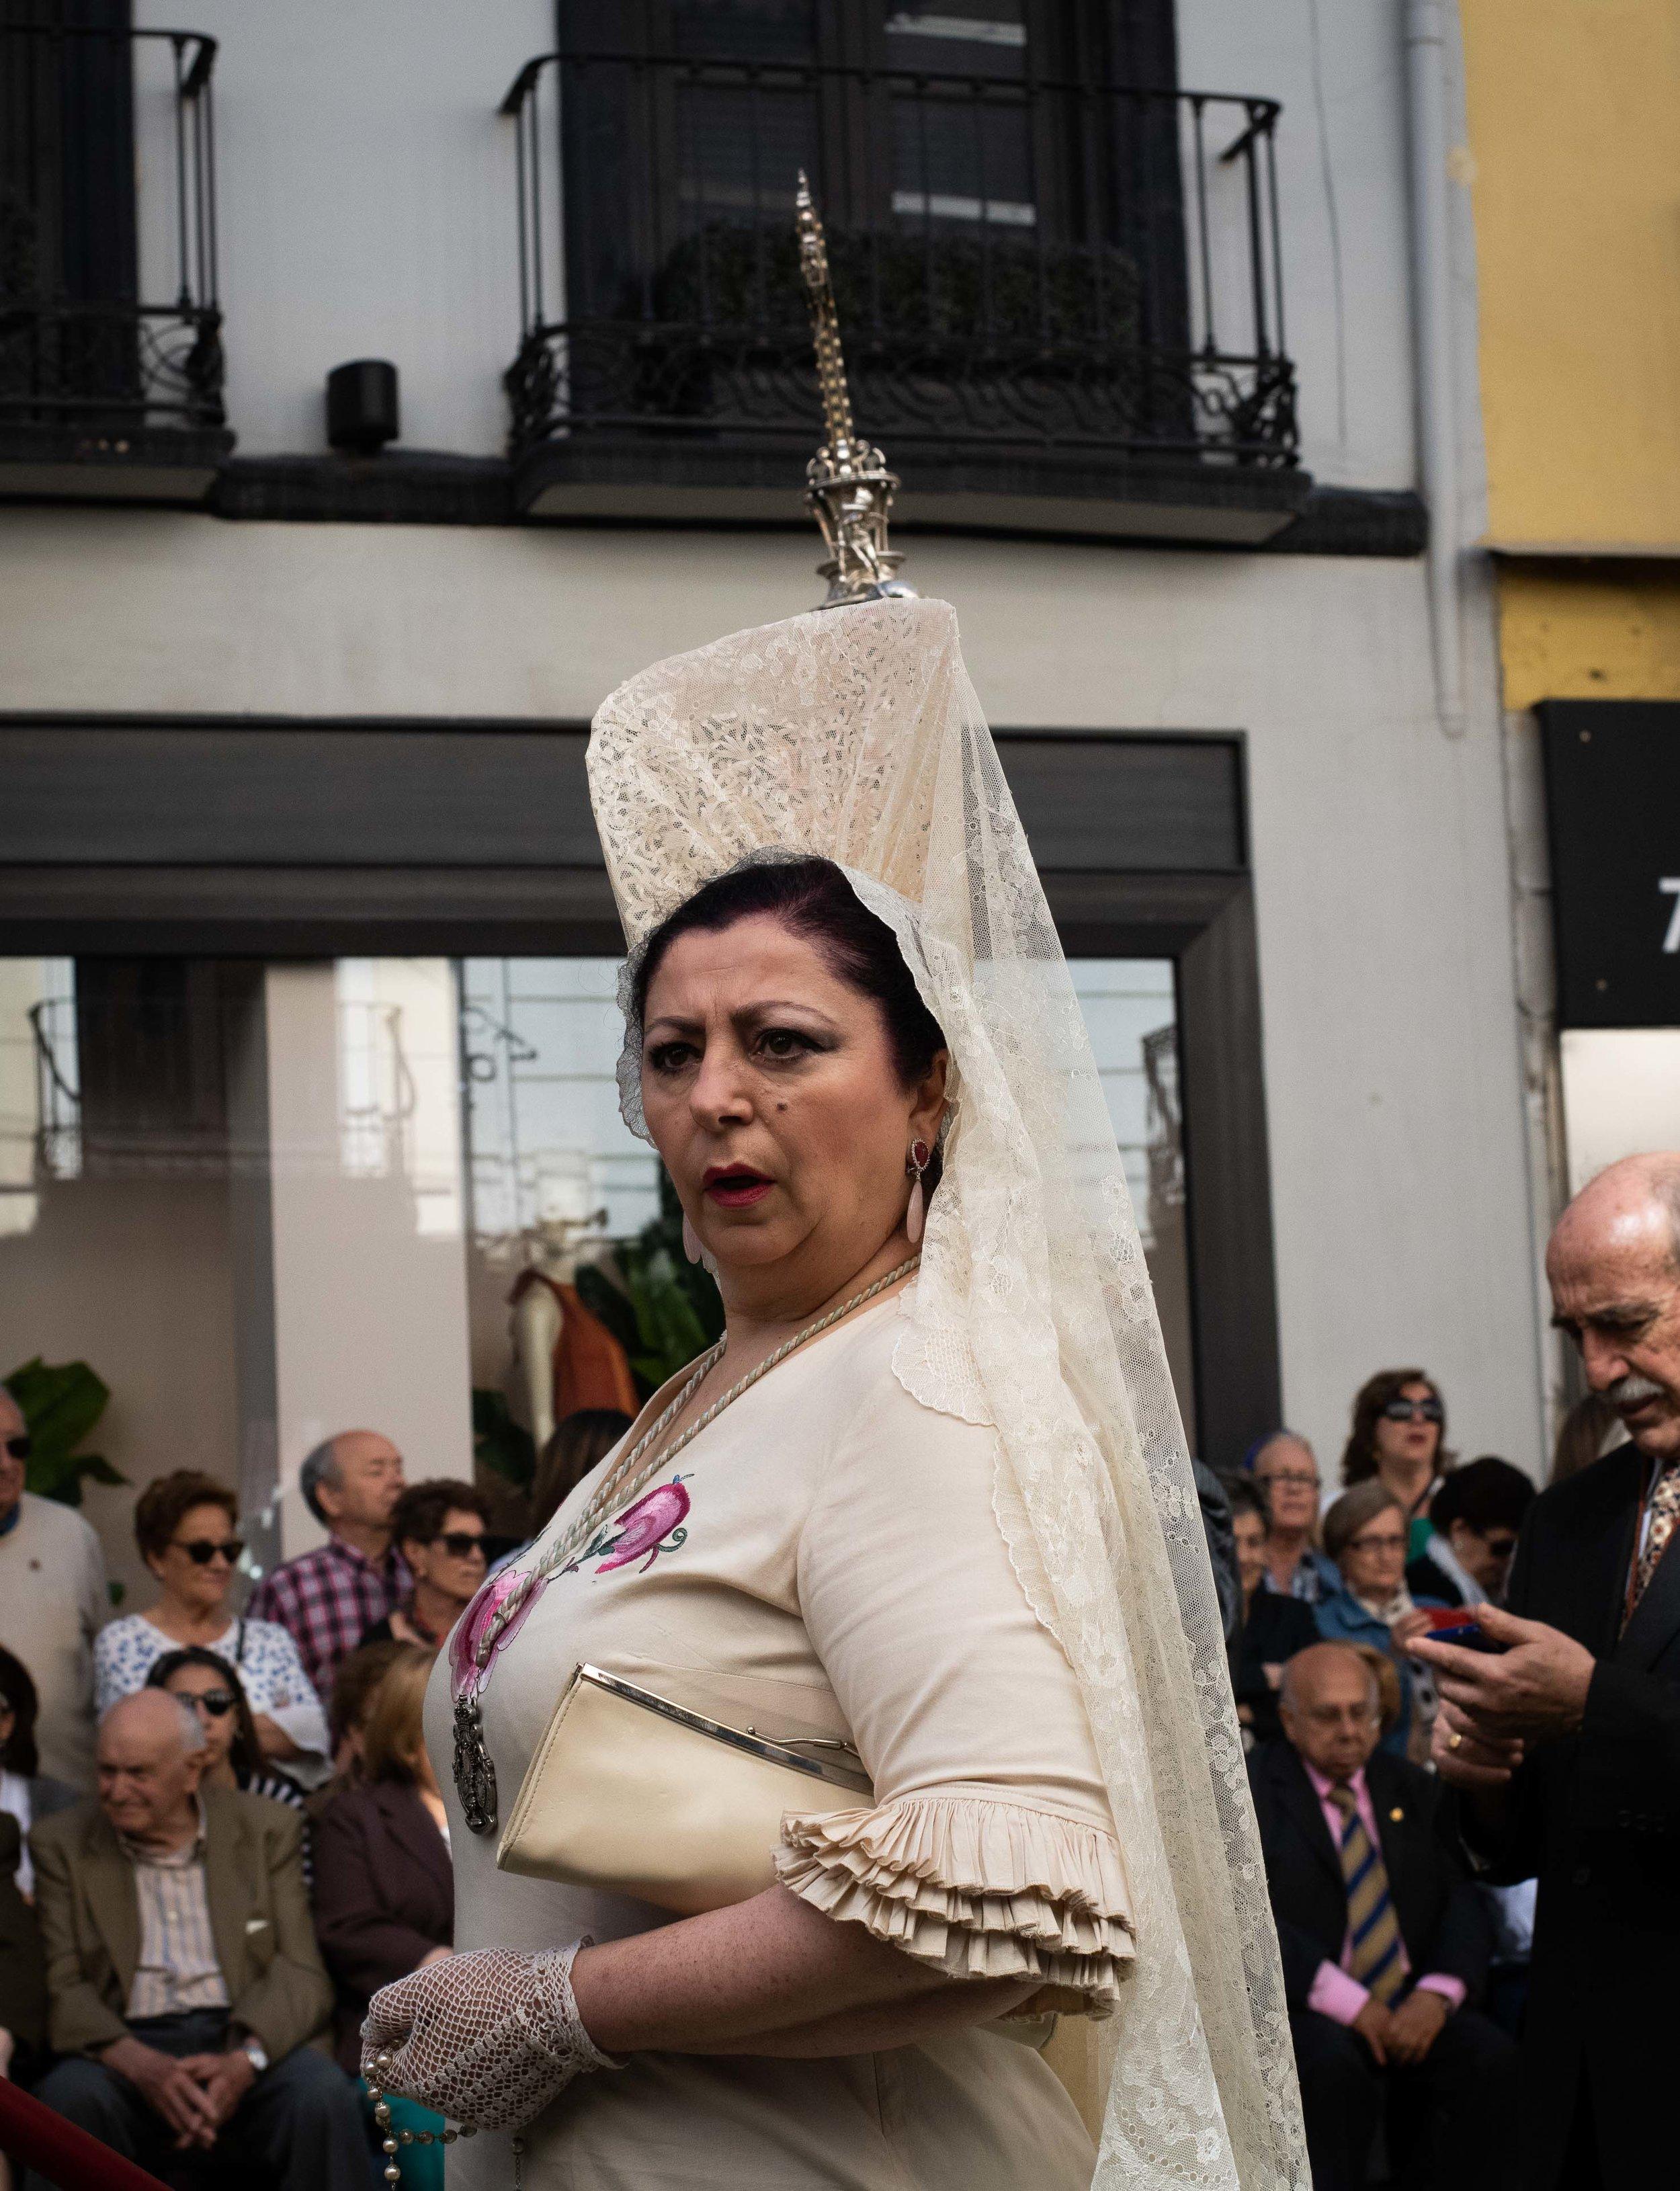 Corpus Christi Festivities. Granada, Spain 2018